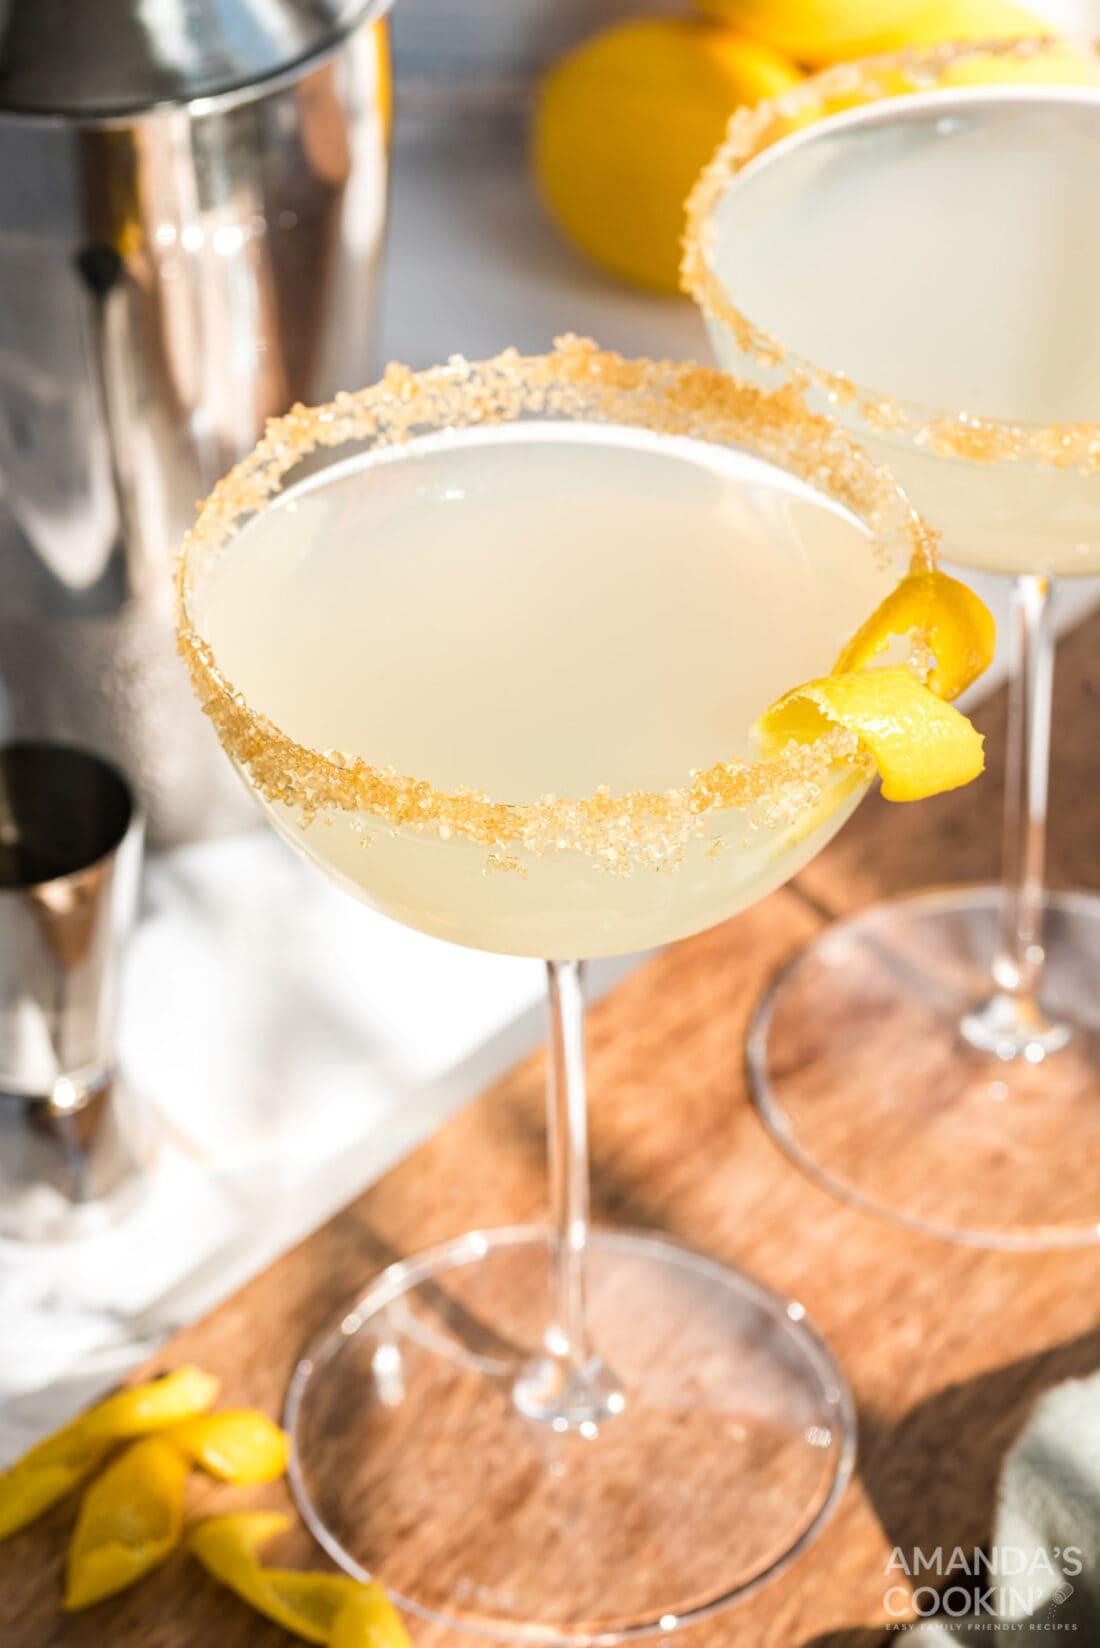 lemon drop in martini glass